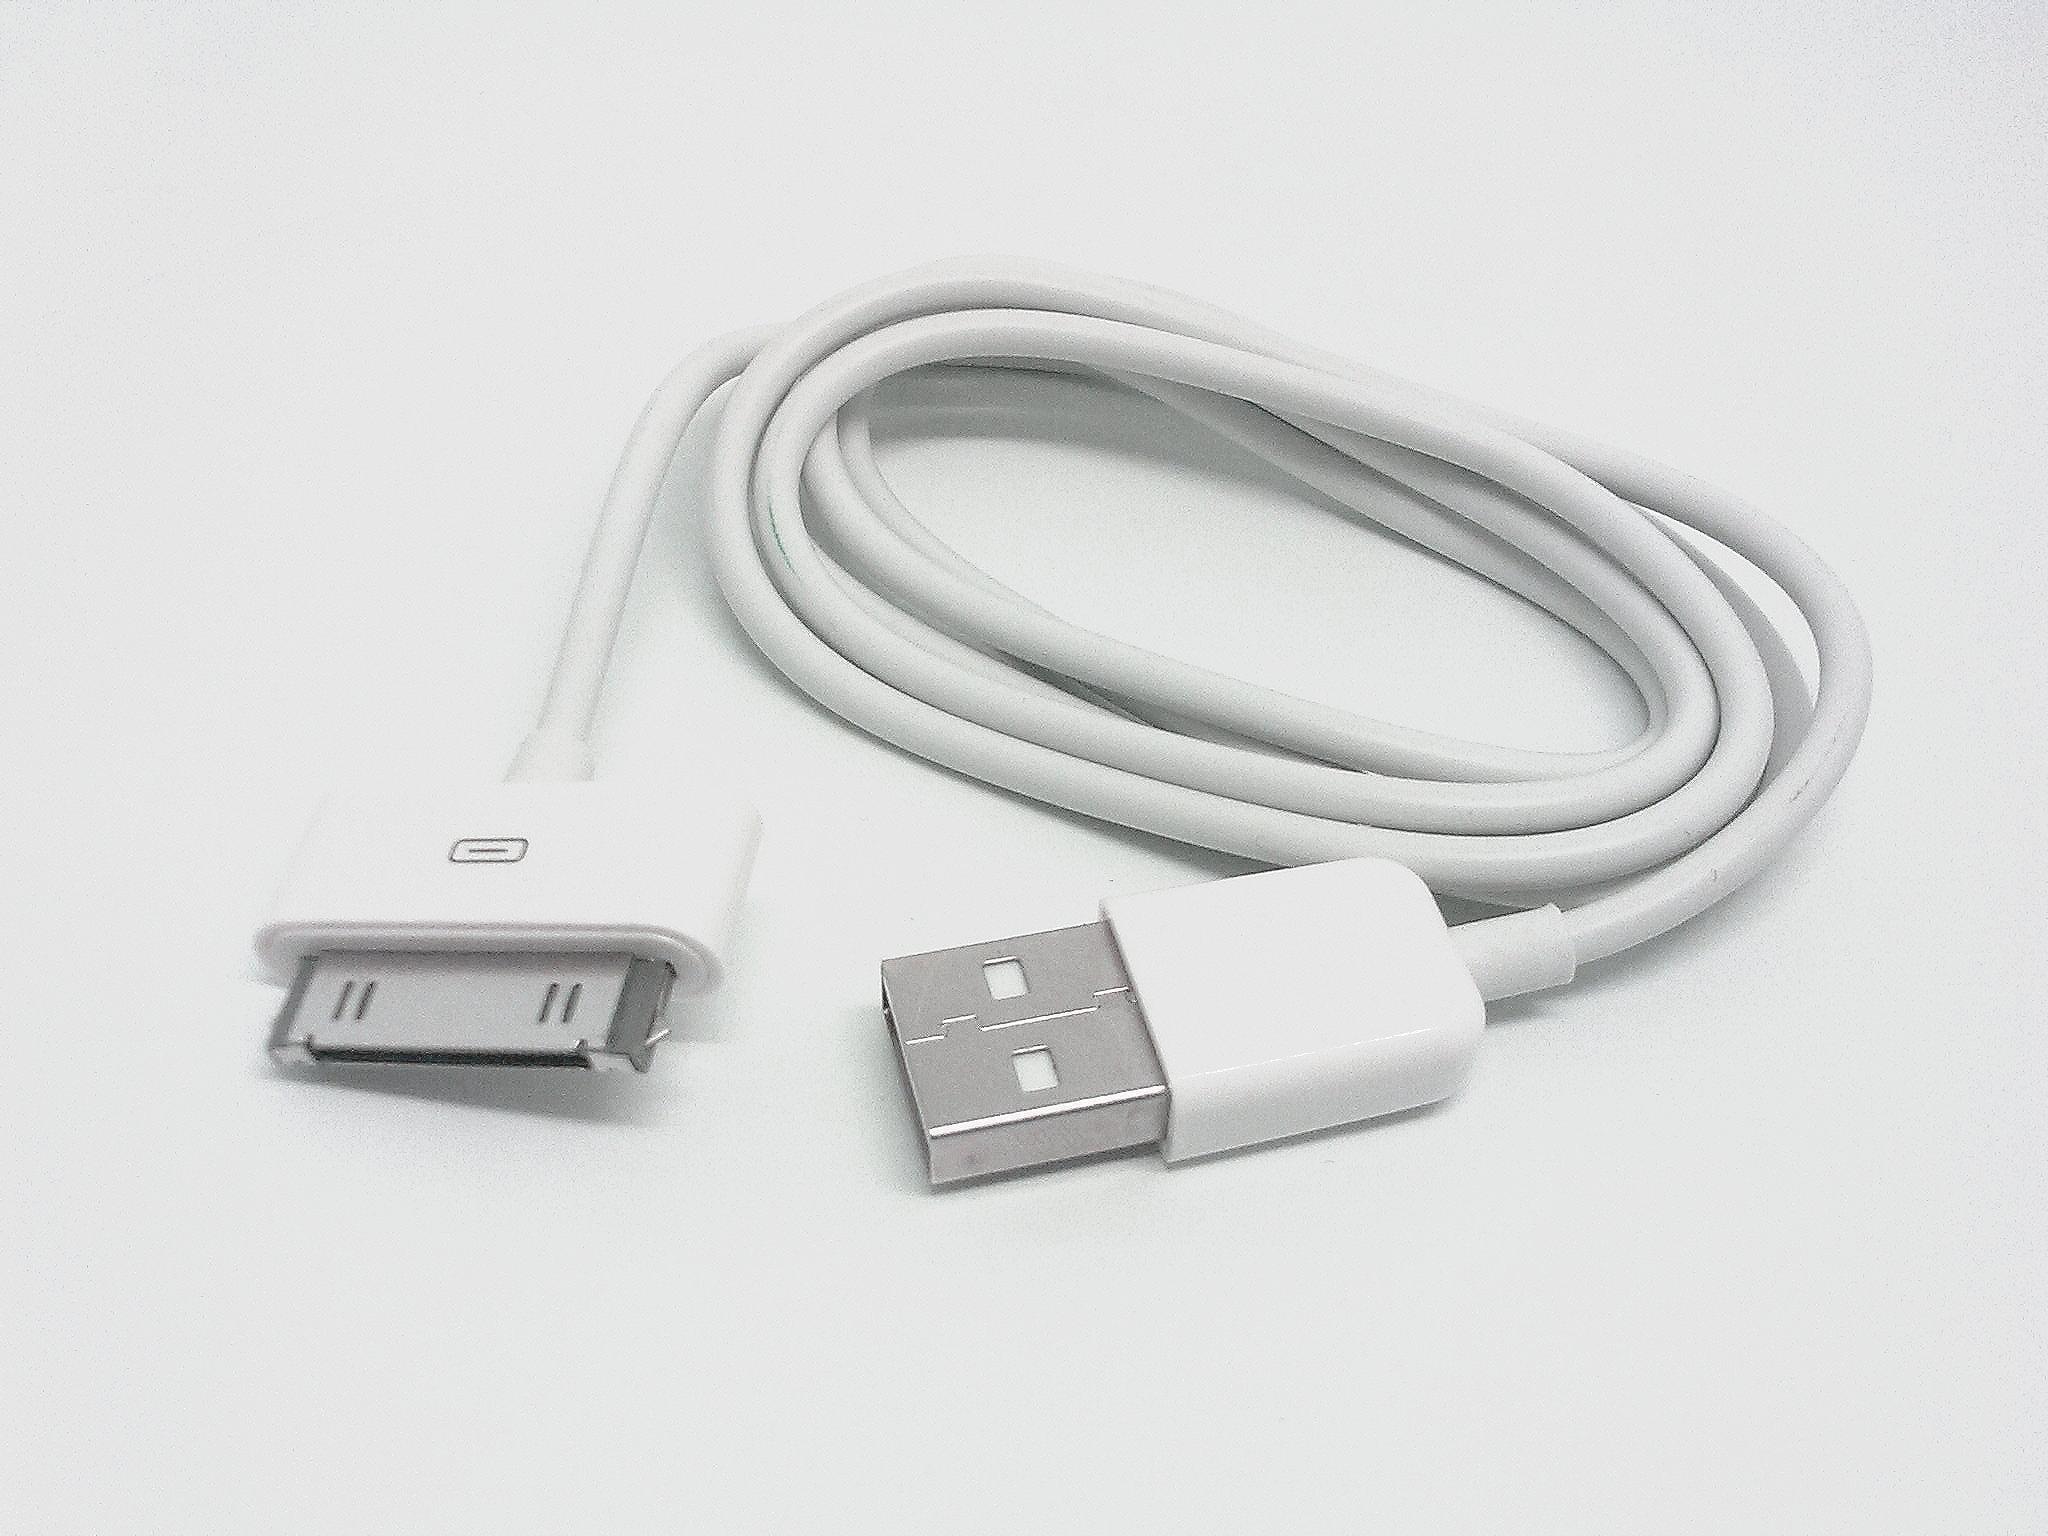 Original Apple Iphone Data Cable Mobile Phone Accessories Sanbei